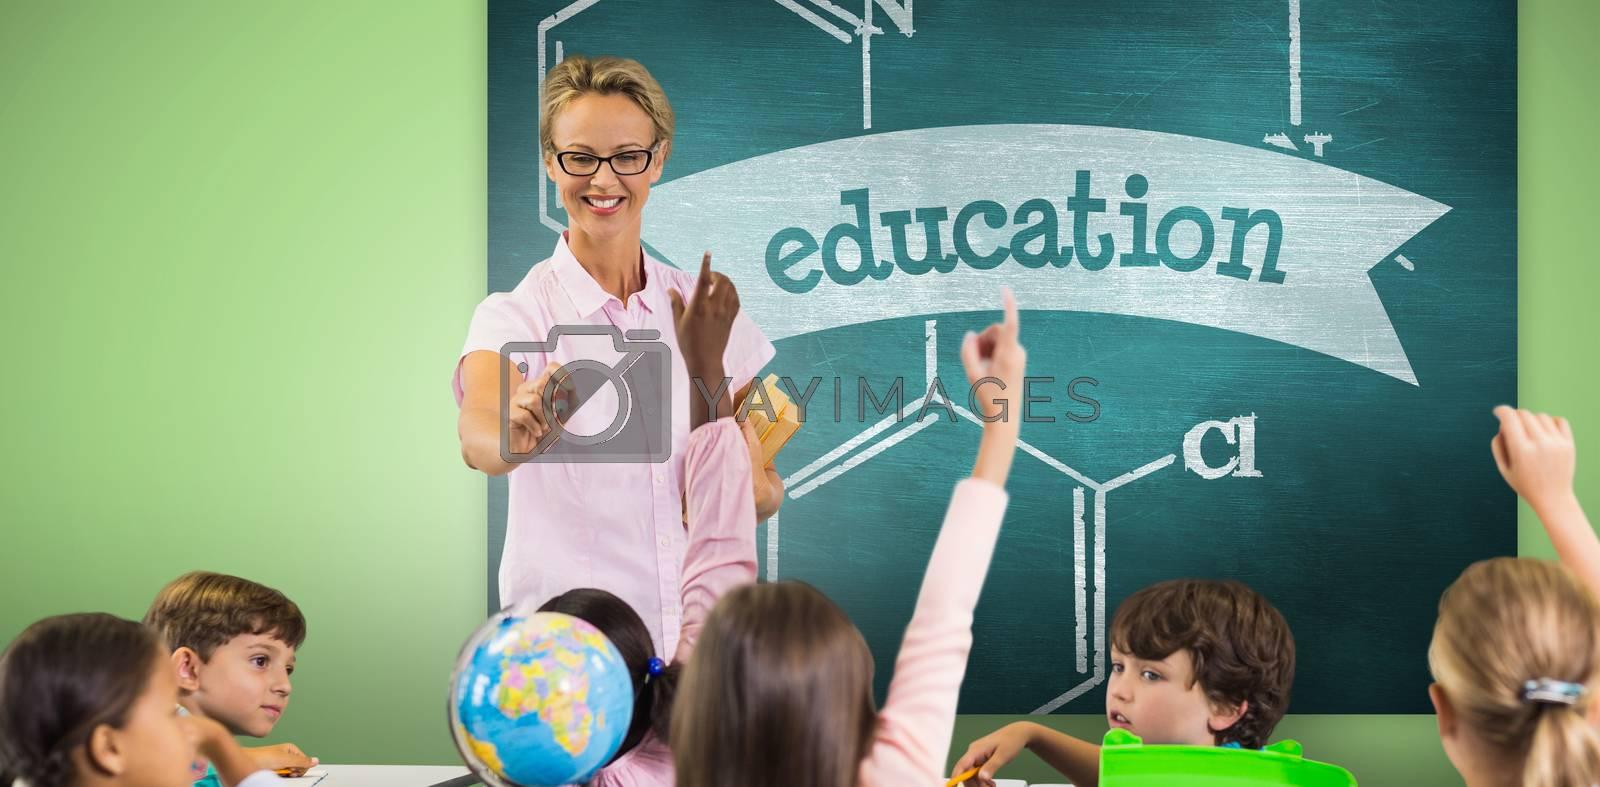 Students raising hands while teacher teaching against education against green chalkboard